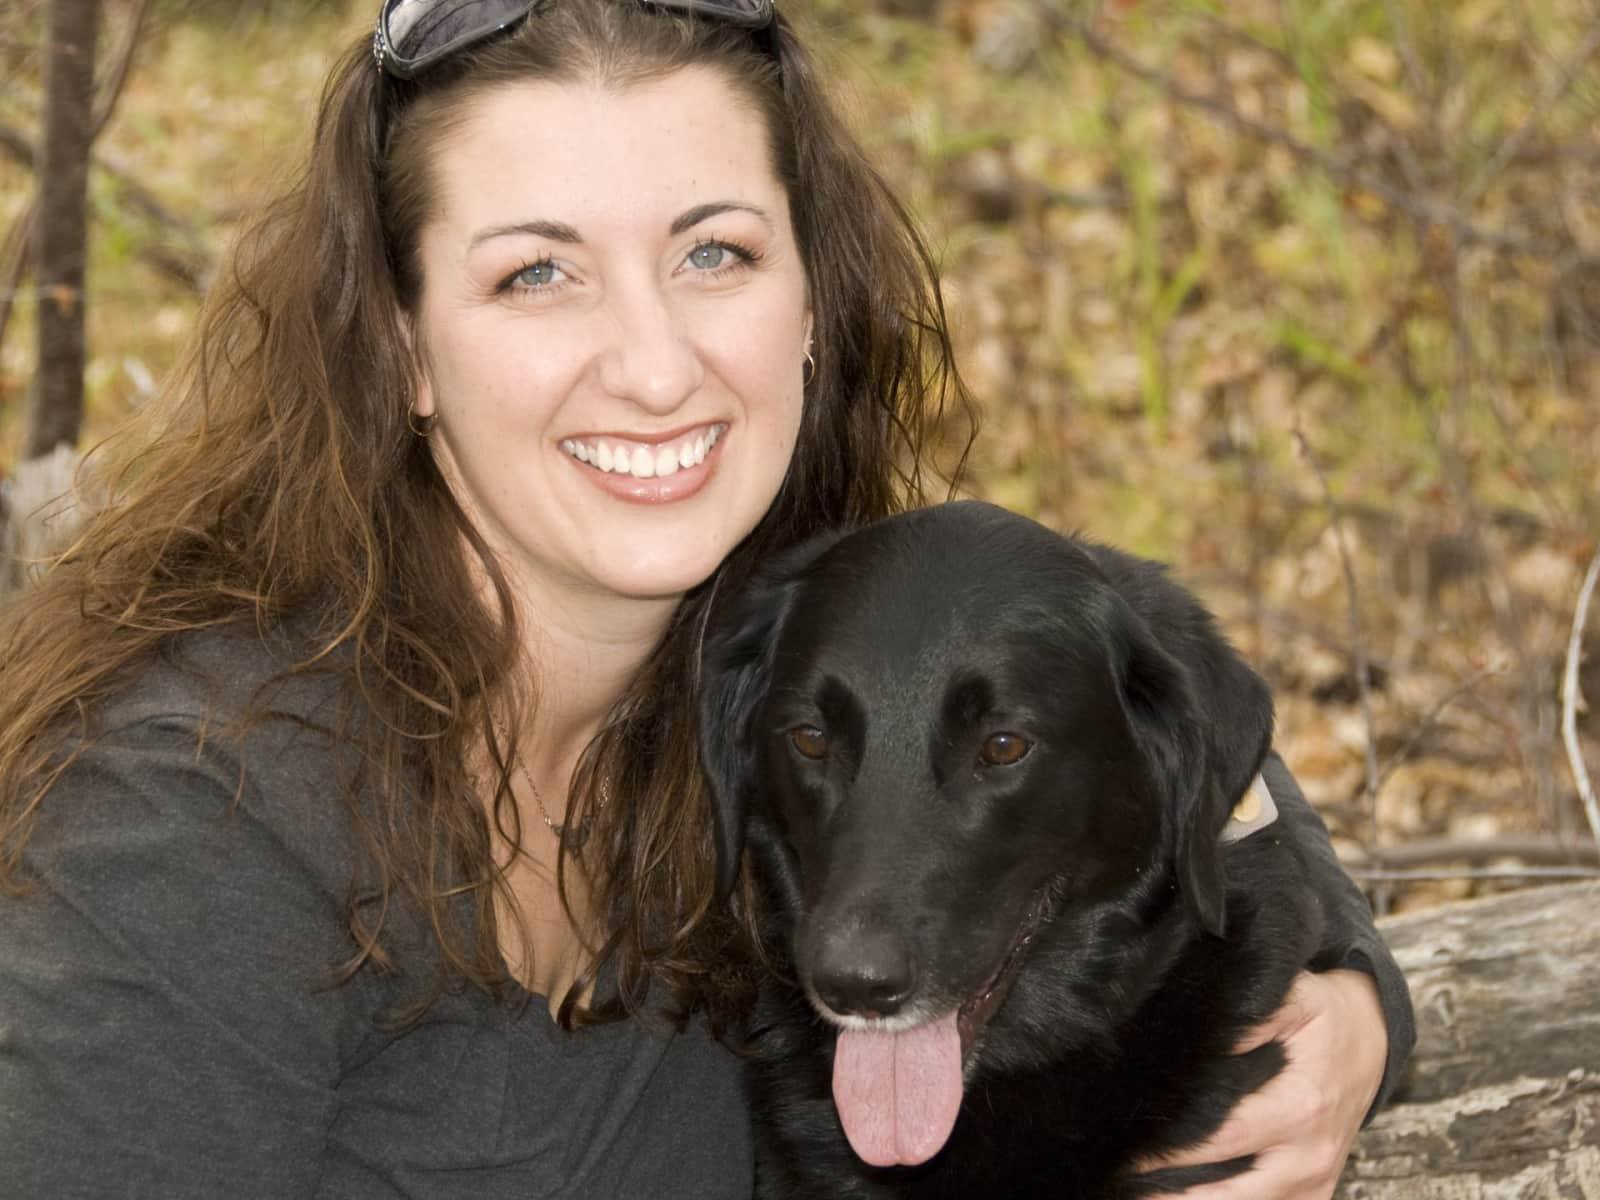 Emma from Okotoks, Alberta, Canada